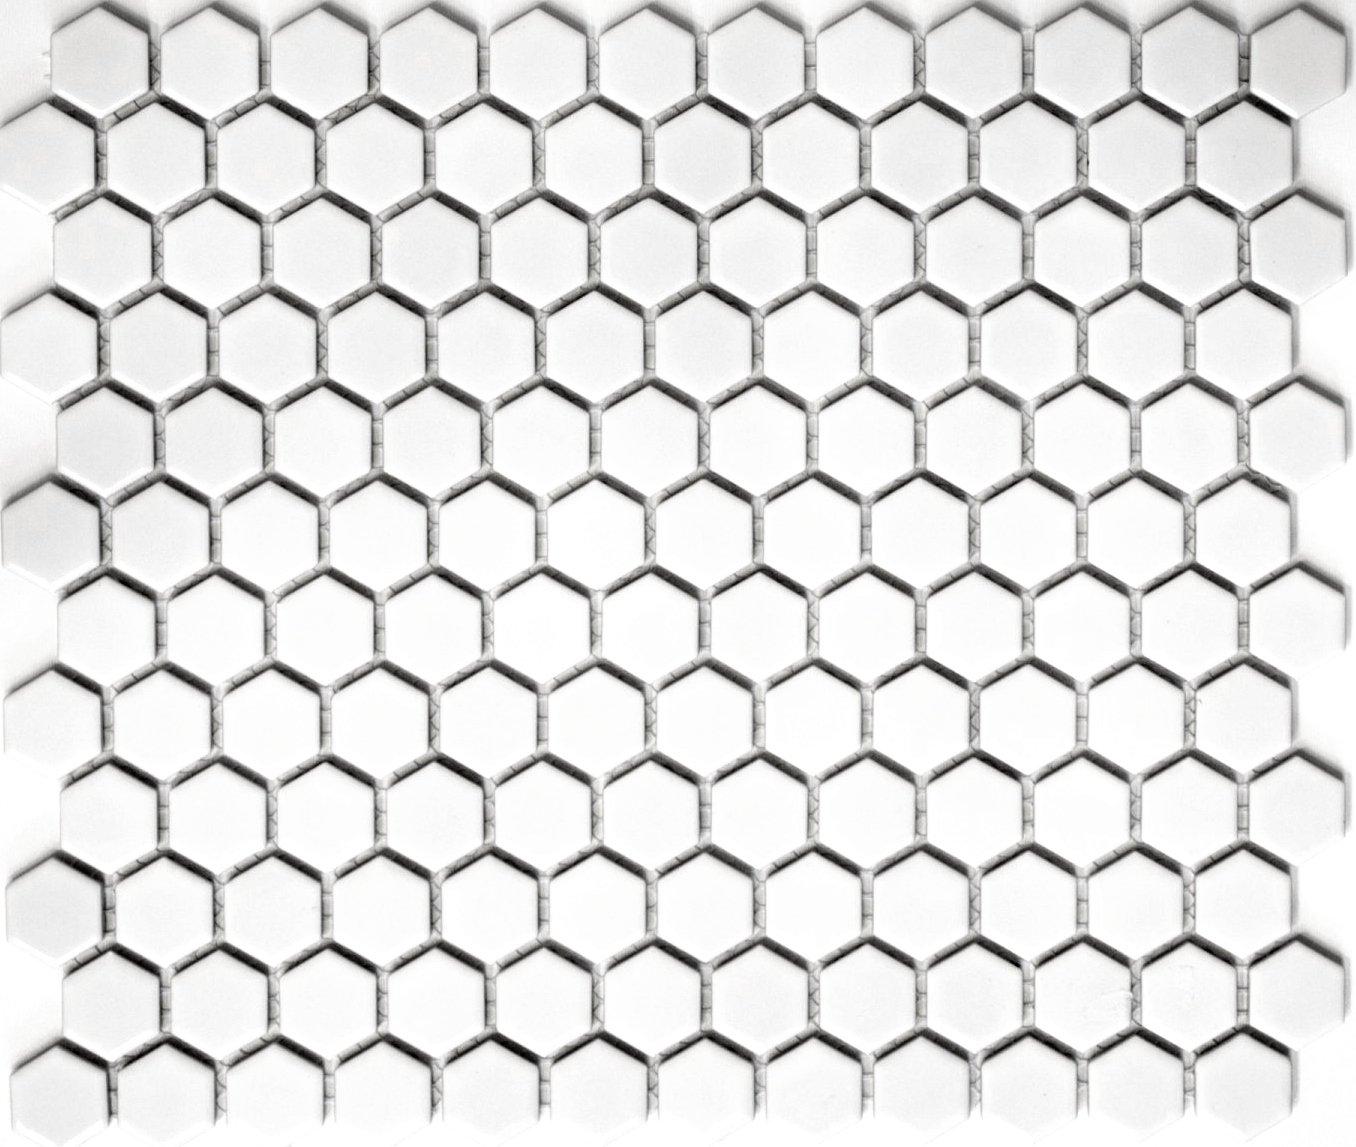 Rete mosaico mosaico piastrelle Hexagon Uni Bianco Lucido ceramica mosaico per piastrelle da parete specchio piatto doccia